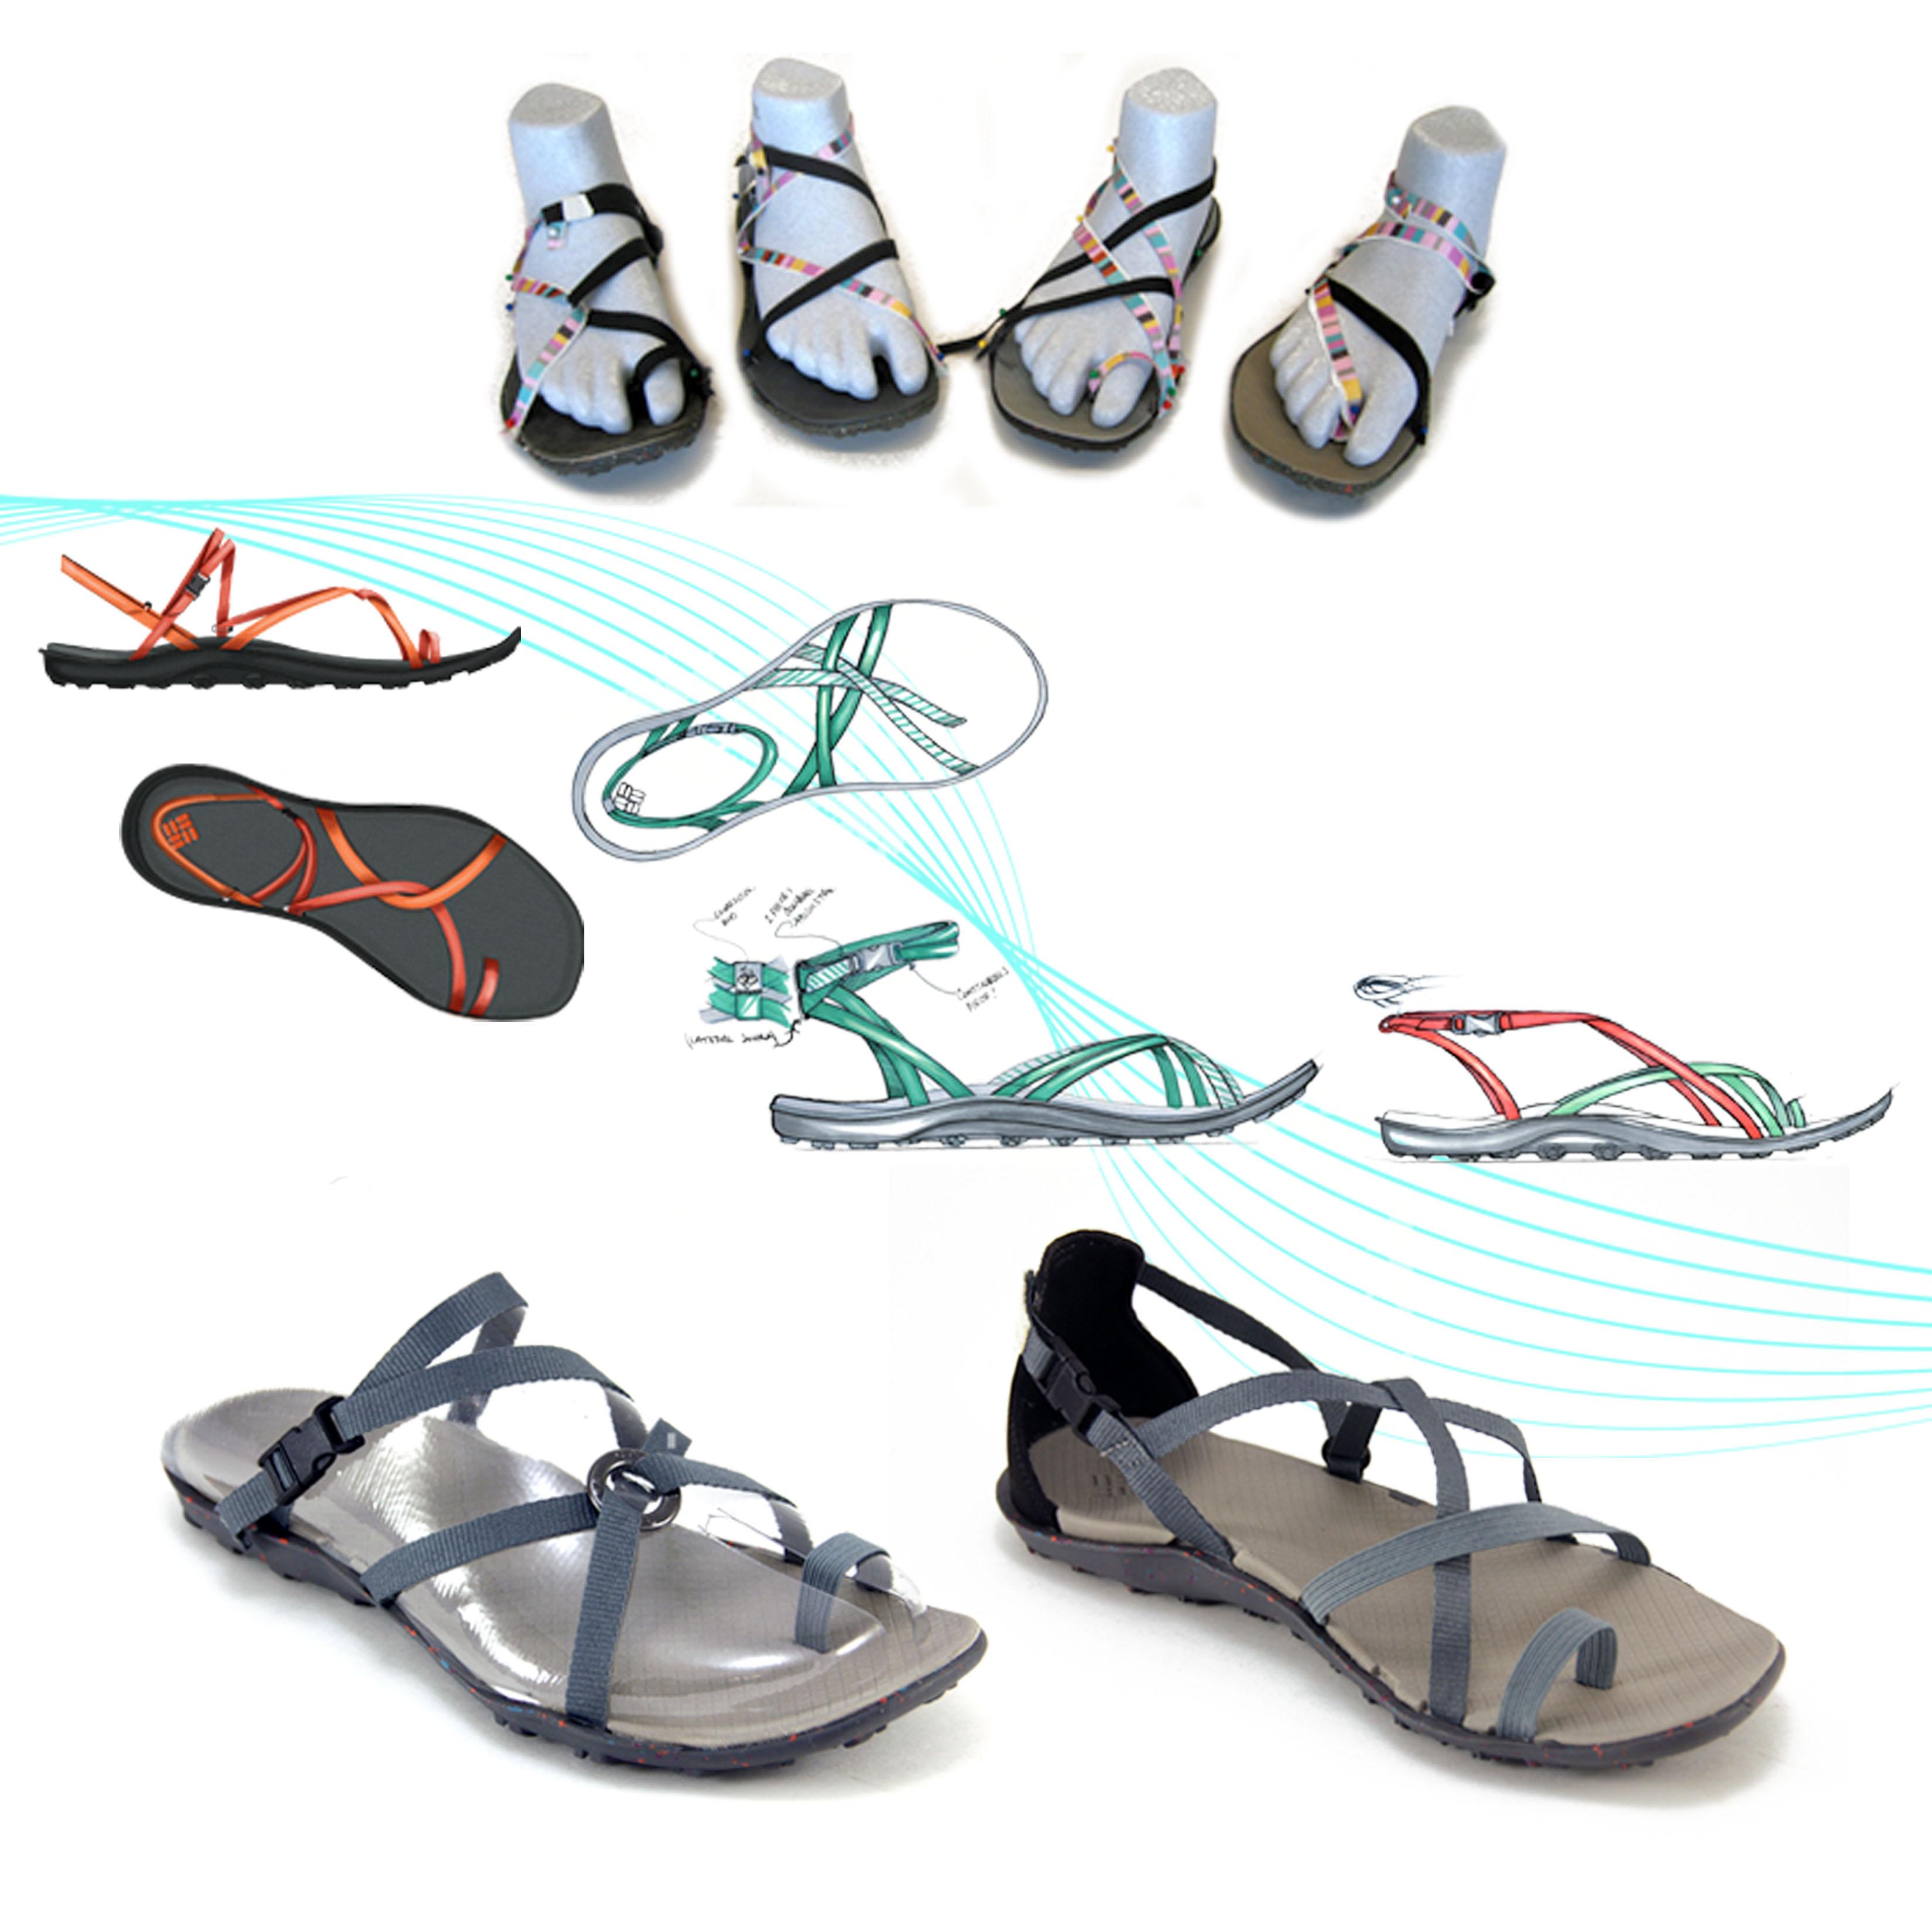 Columbia Sportswear F10 S14 April Mcnamara Sandal Skyway S13 Rivertech Sandals